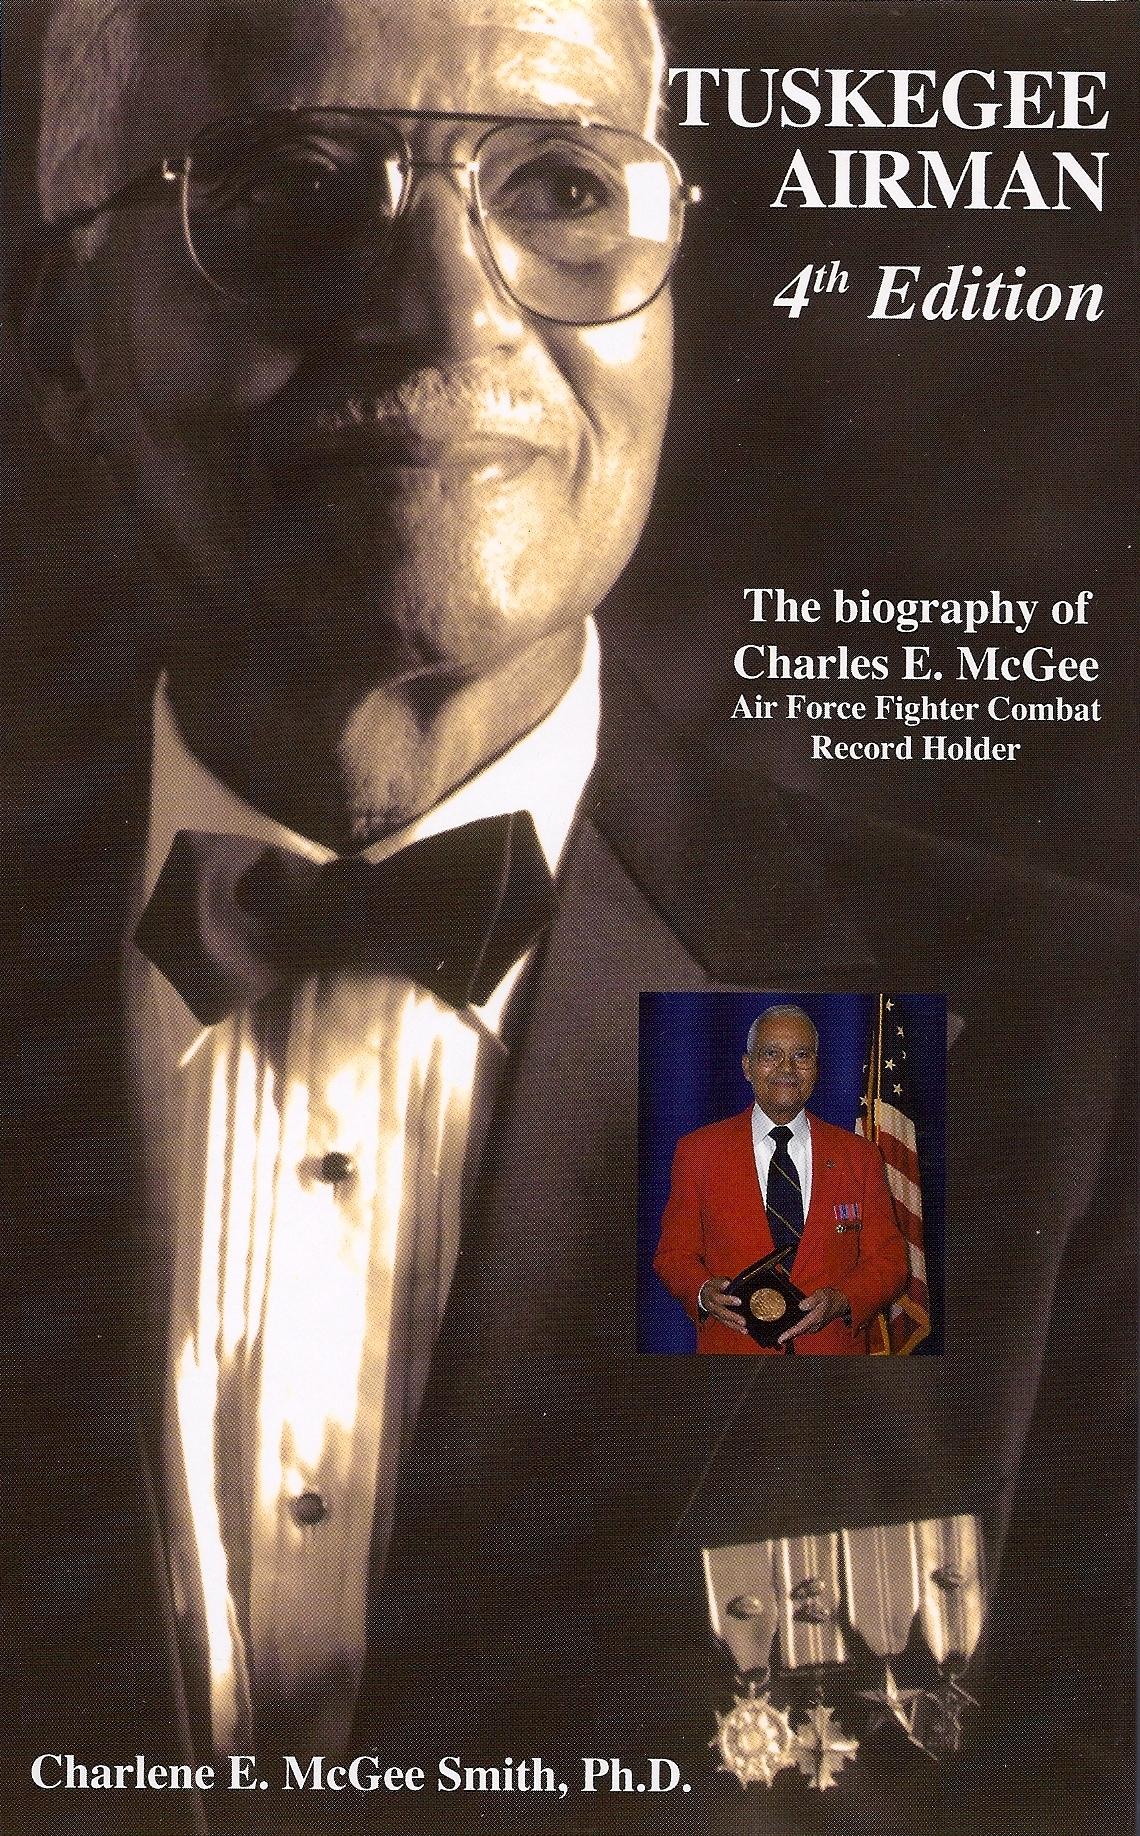 Tuskegee Airman Book